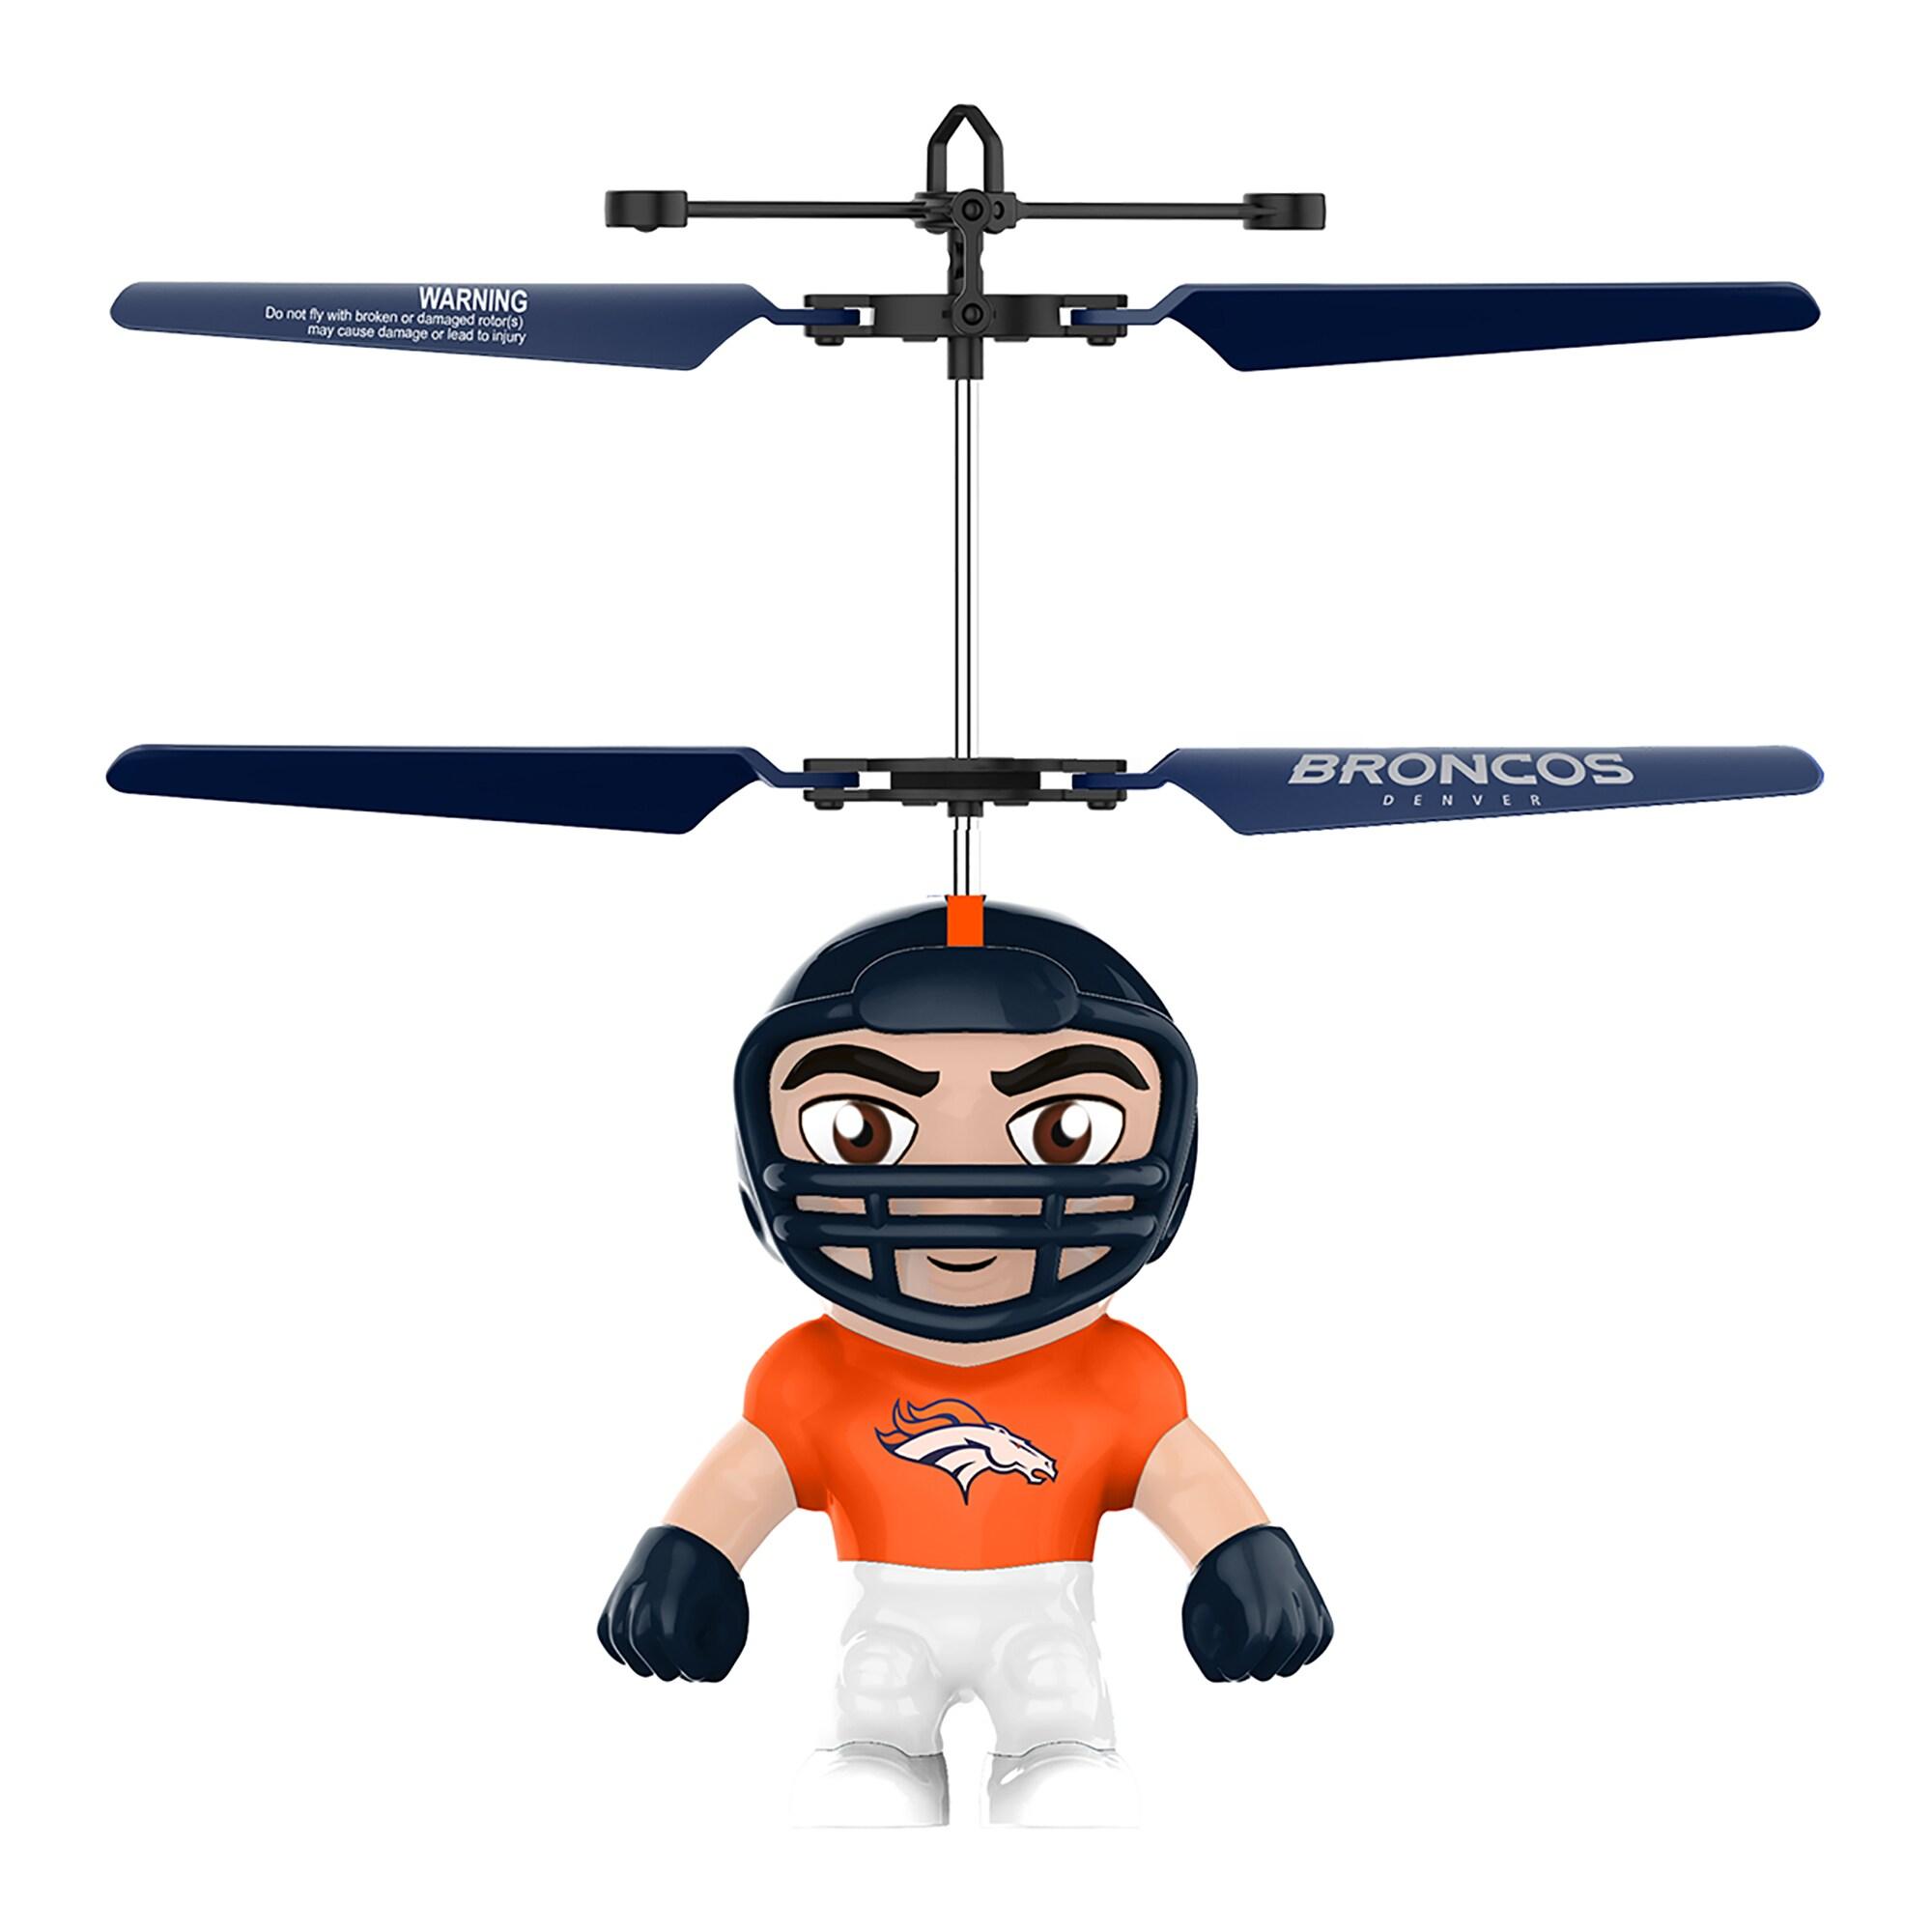 Denver Broncos Hand-Sensor Figure Flyer